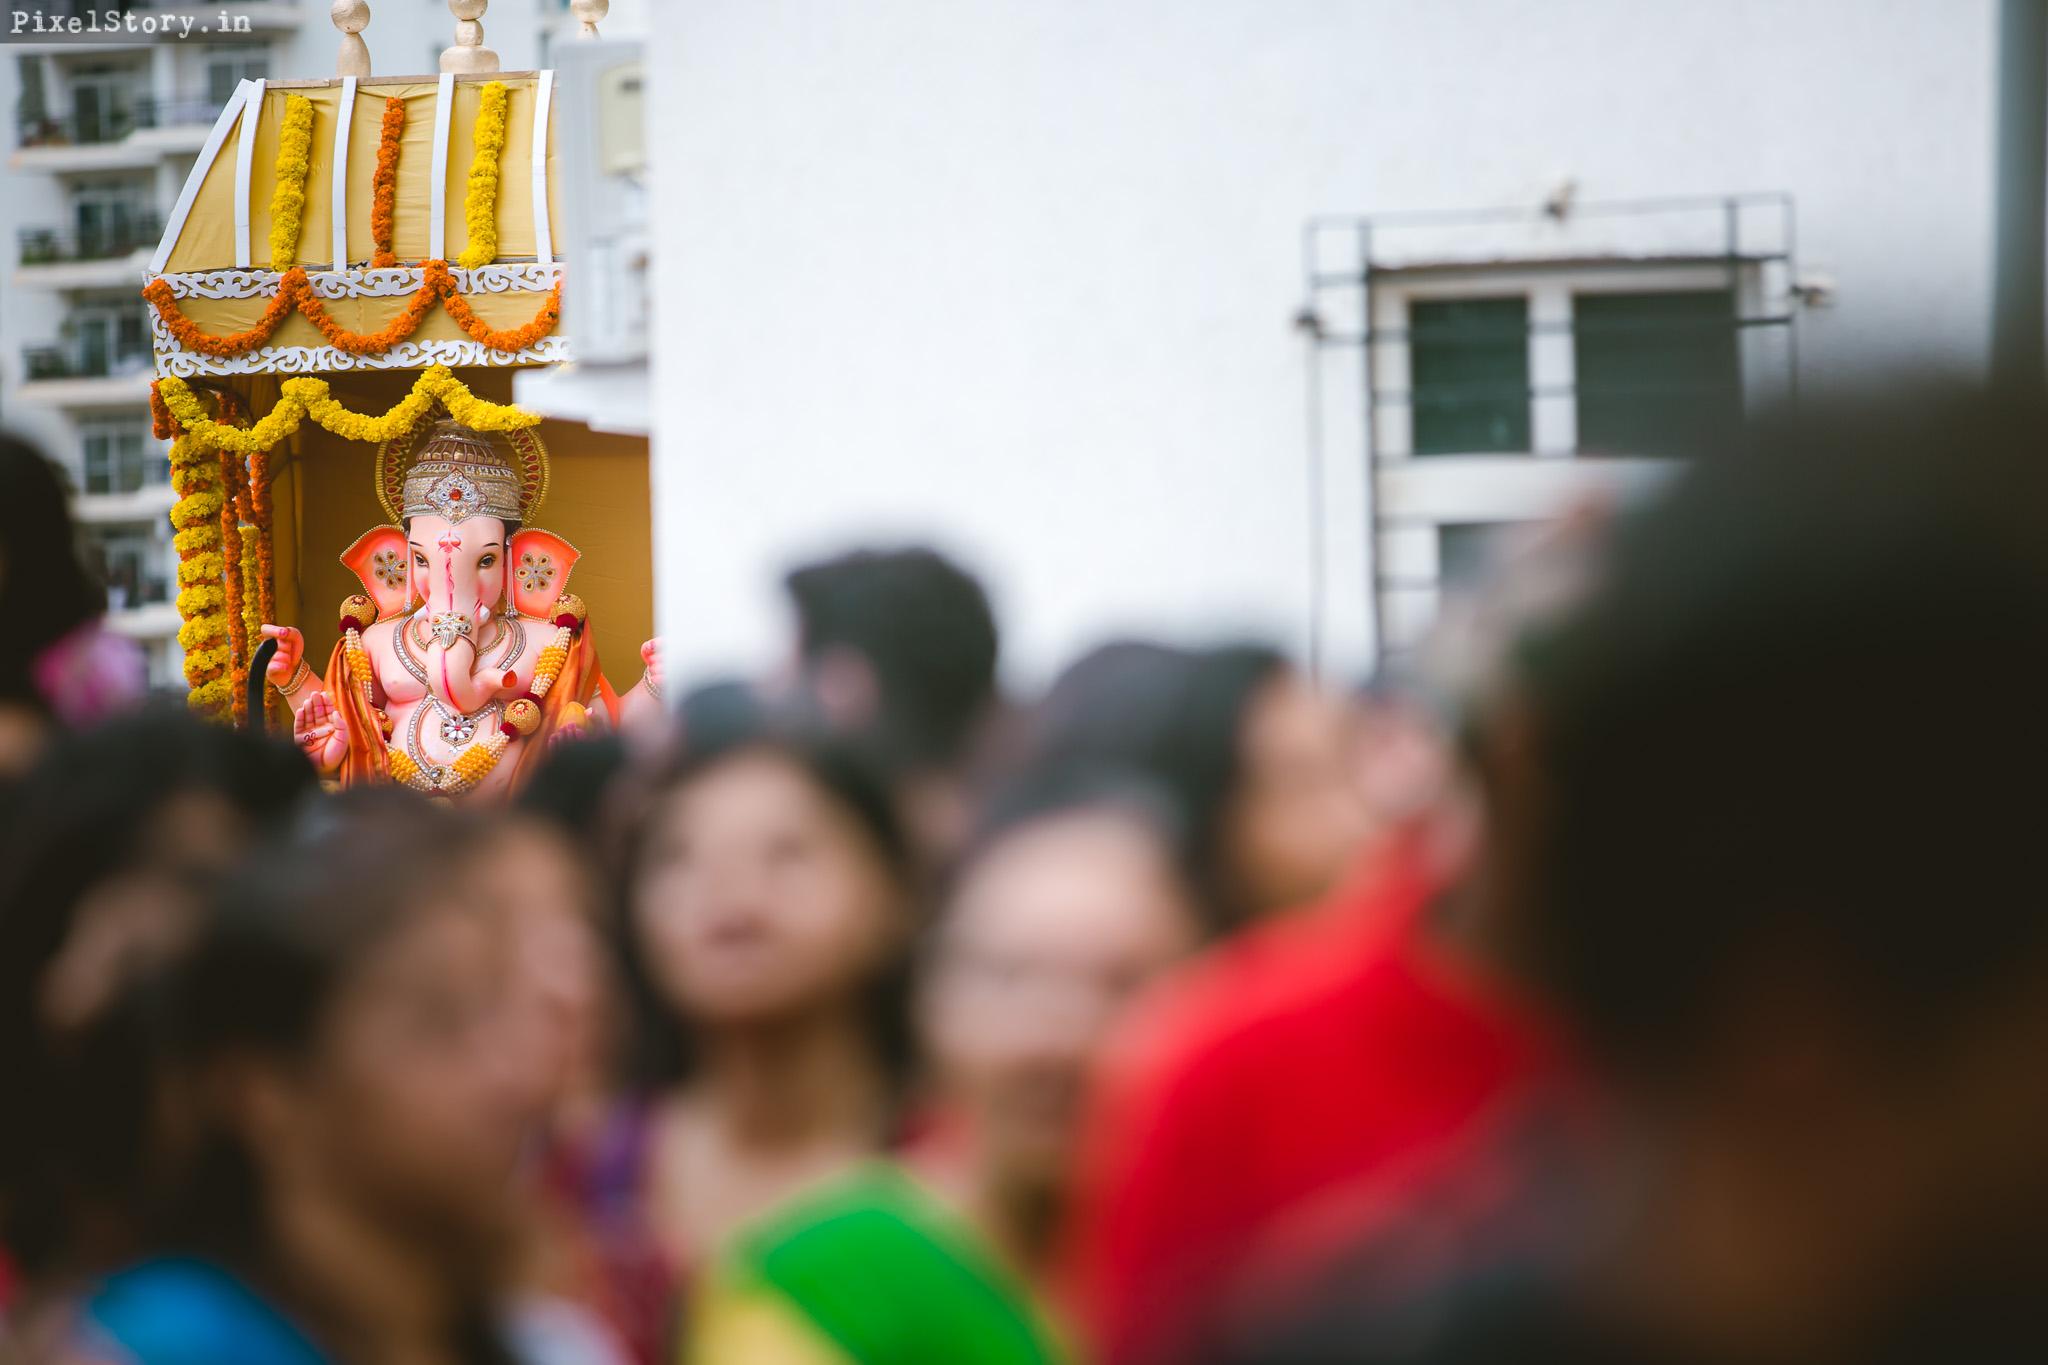 PixelStory-Ganesh-Utsav-2017-137.jpg